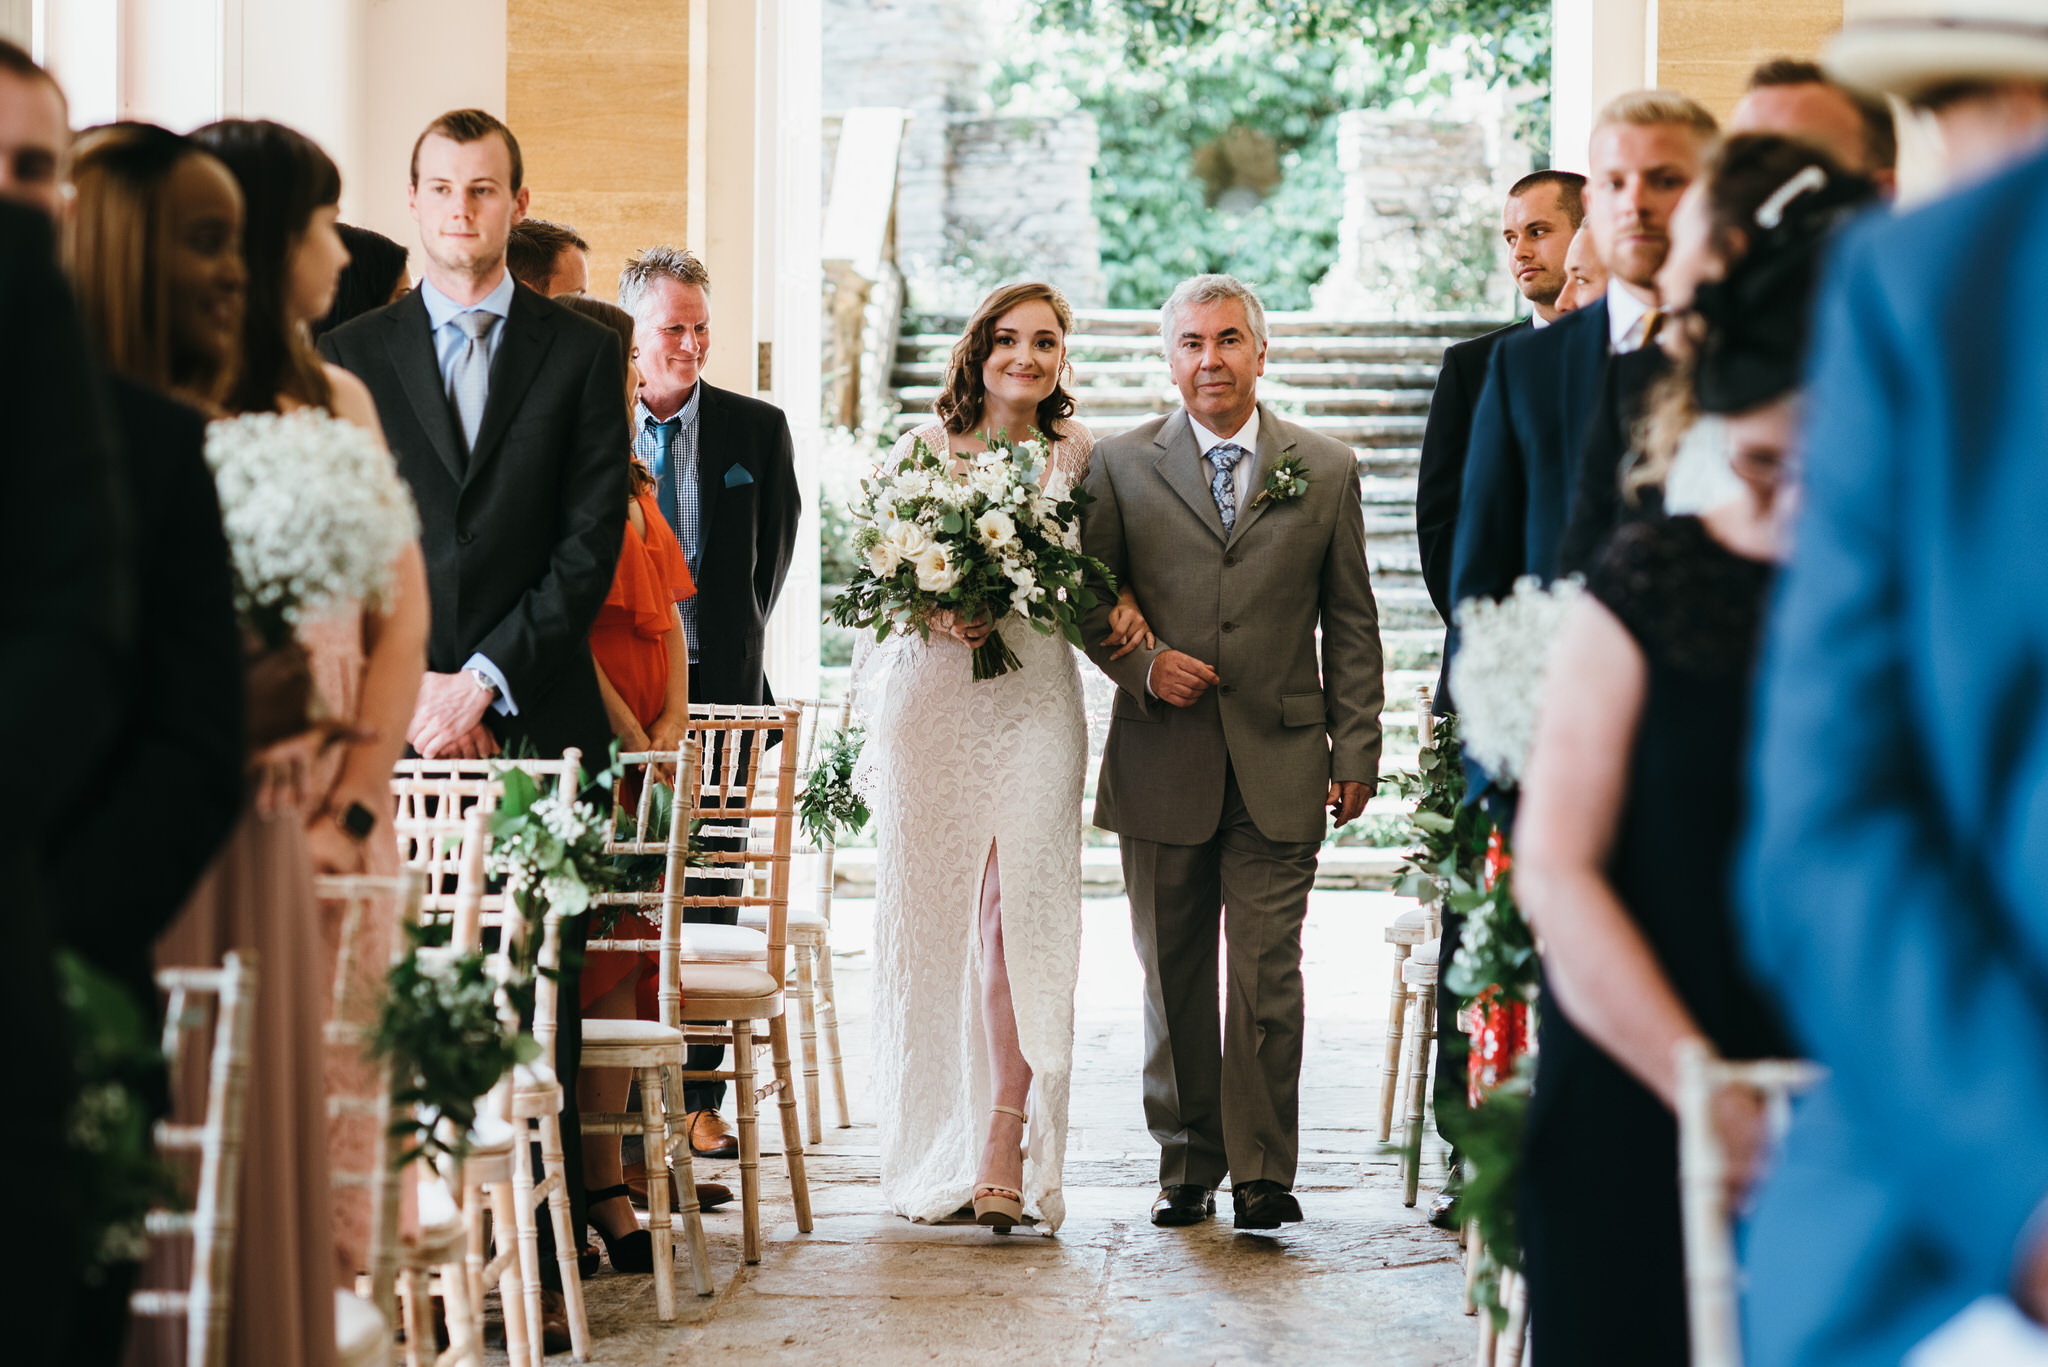 Bride walks down aisle Hestercombe